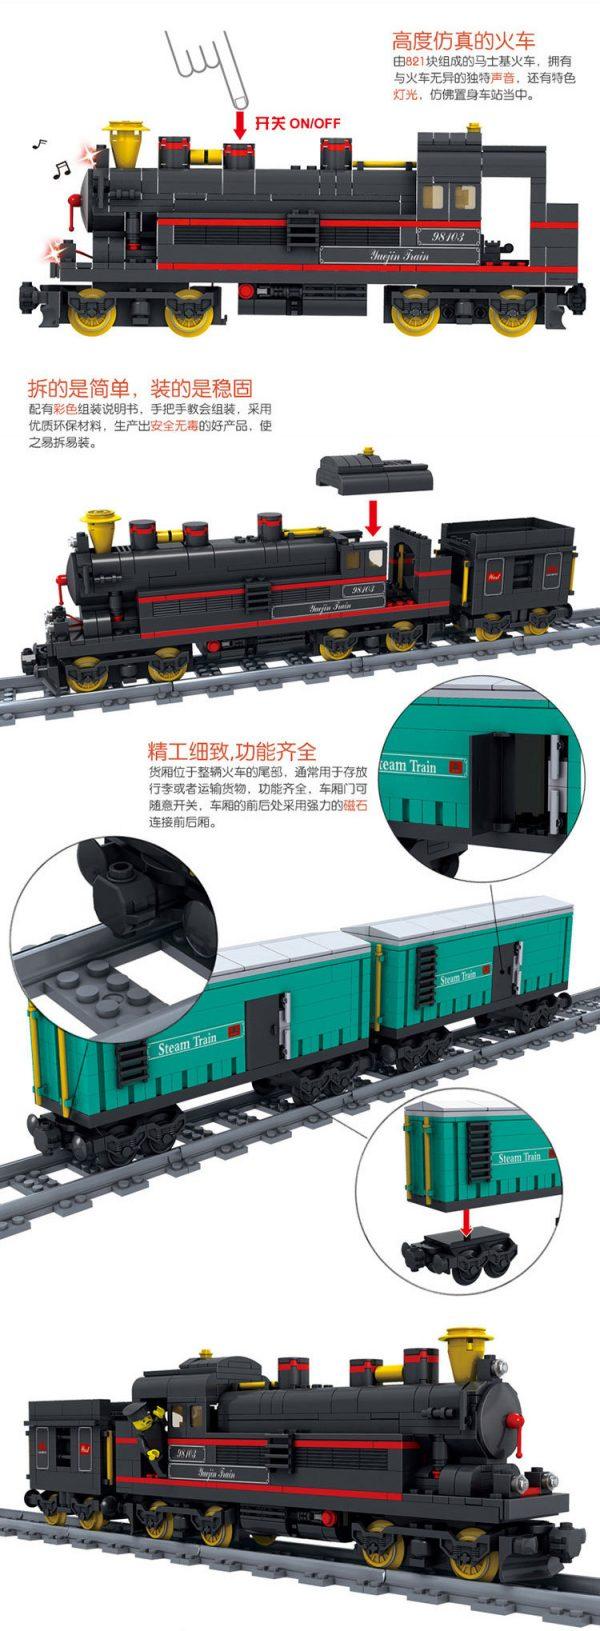 KAZI / GBL / BOZHI KY98103 Rail Train: Leap Forward 2